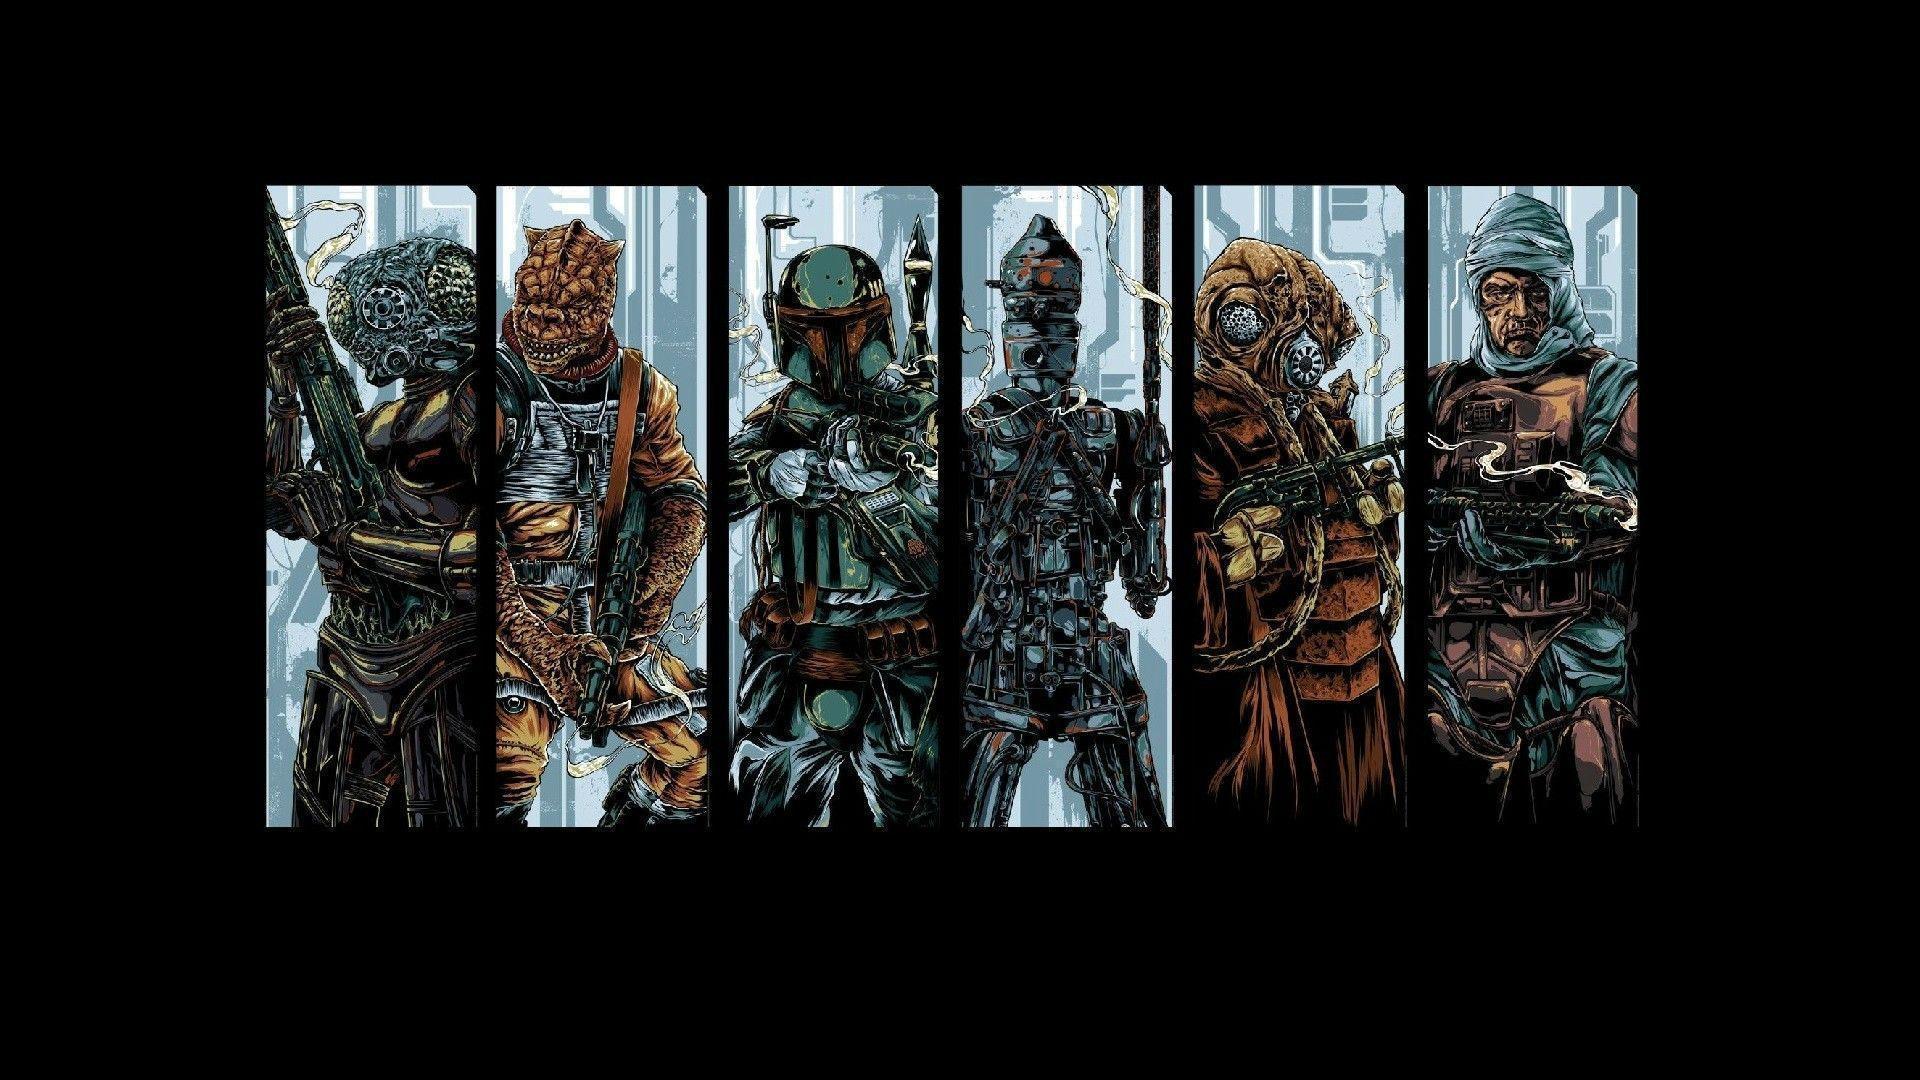 Star Wars Bounty Hunter Wallpapers Top Free Star Wars Bounty